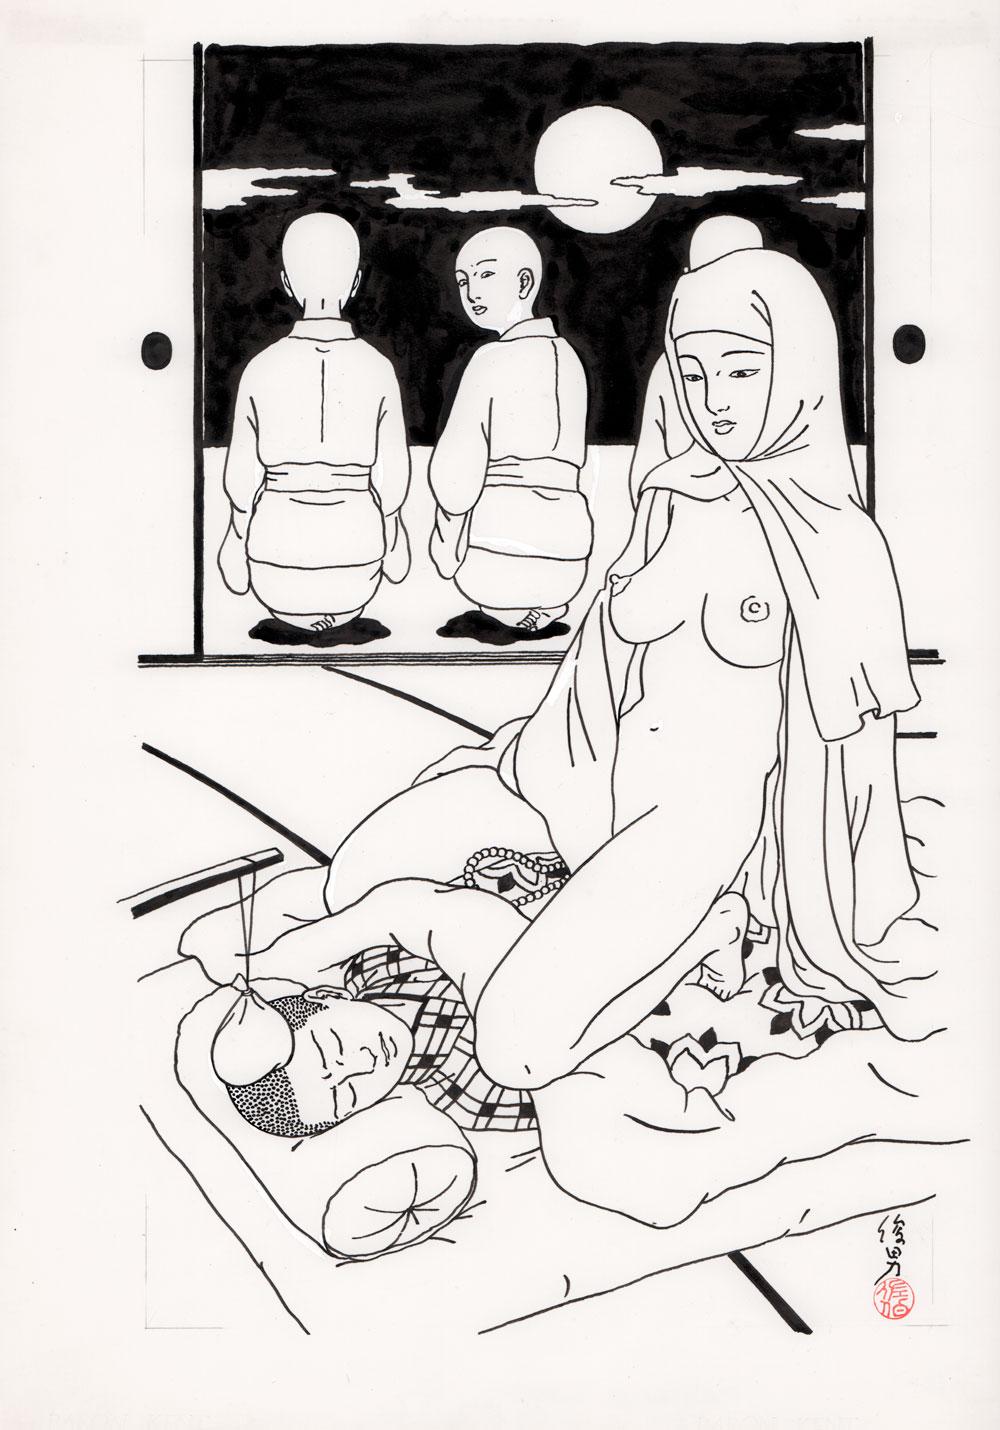 Toshio SaekiIronenbutsu, 1977Ink on paper.11.75 x 16 in. unframed